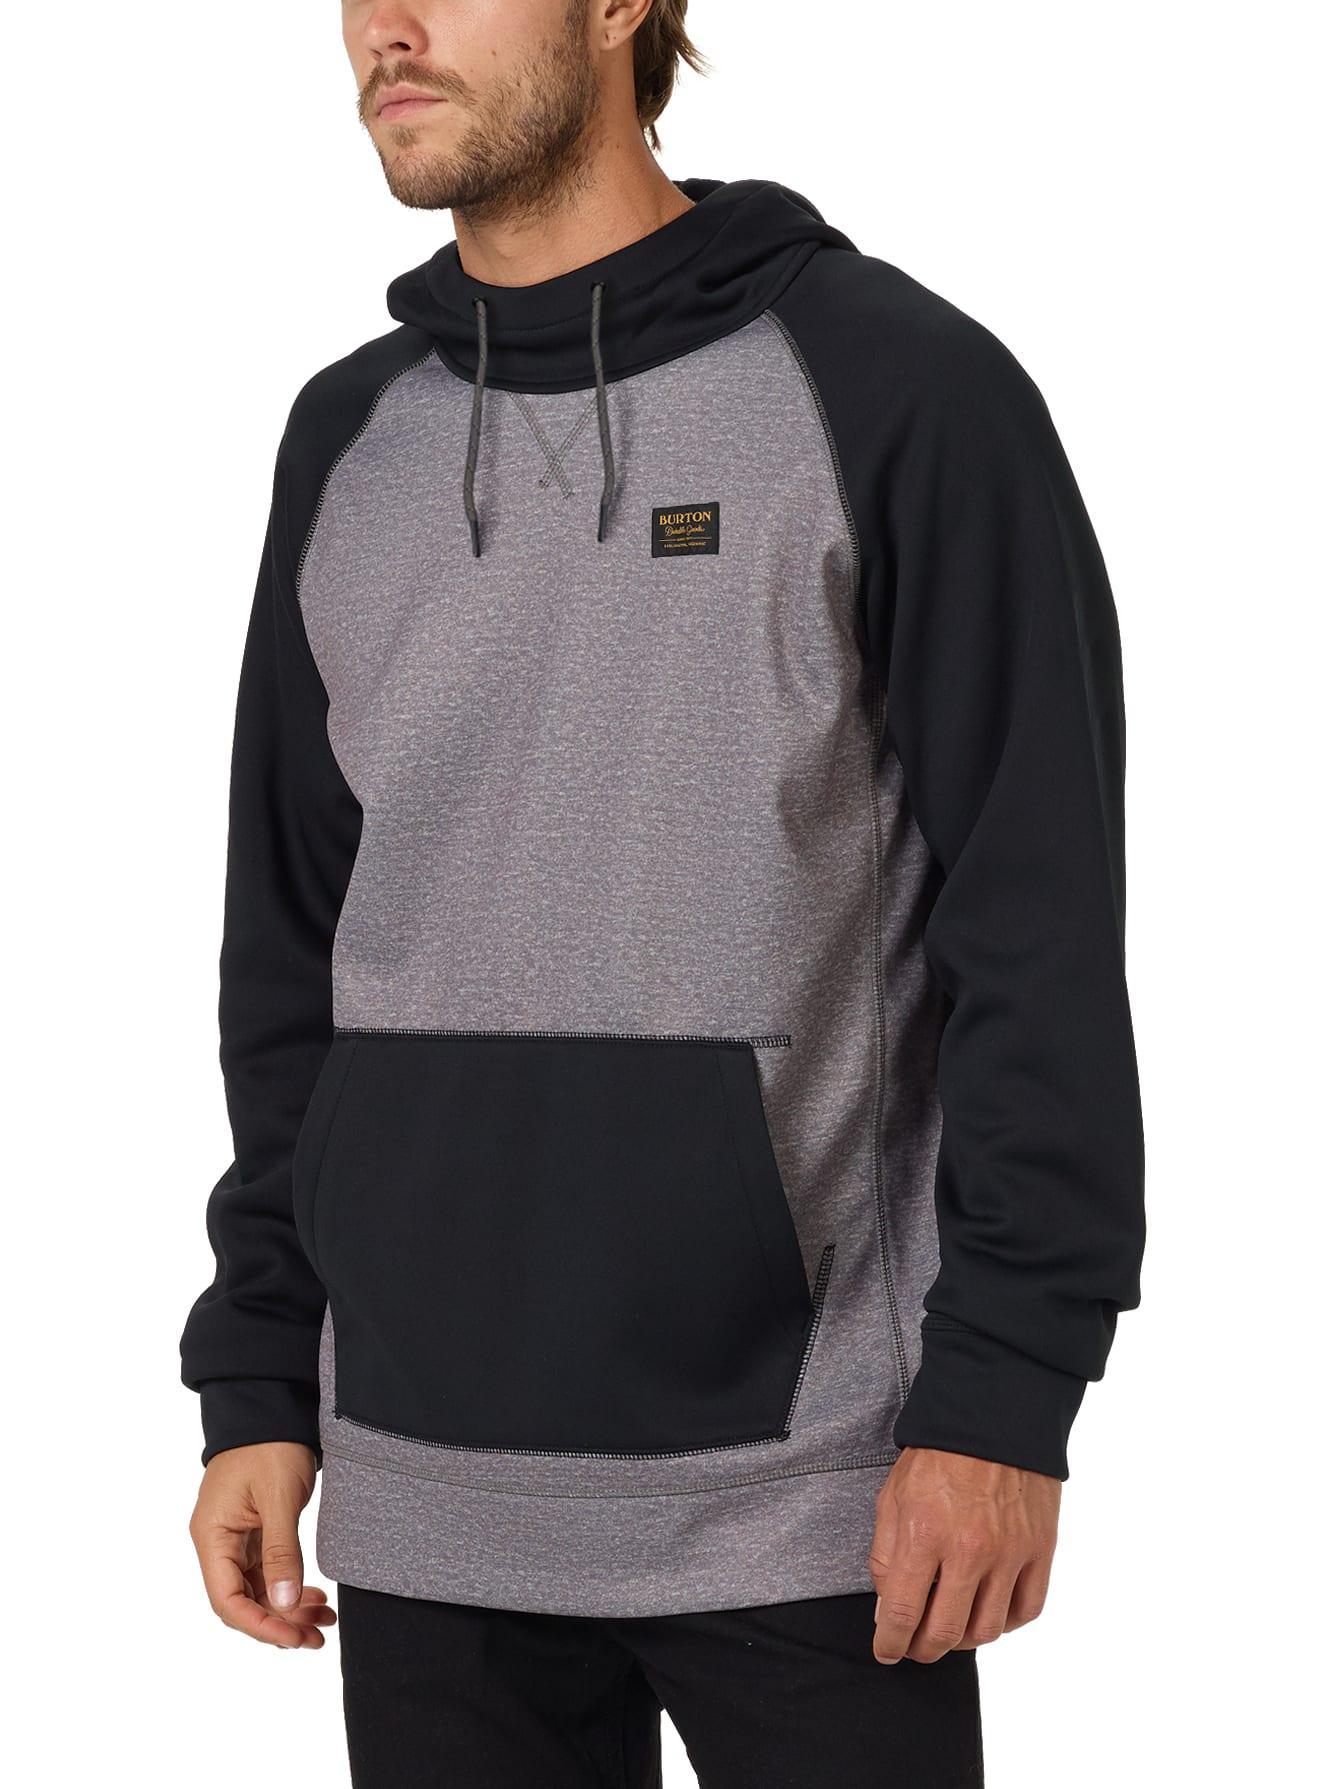 online porter hoodie sleeper black head detail burton ex share plus products